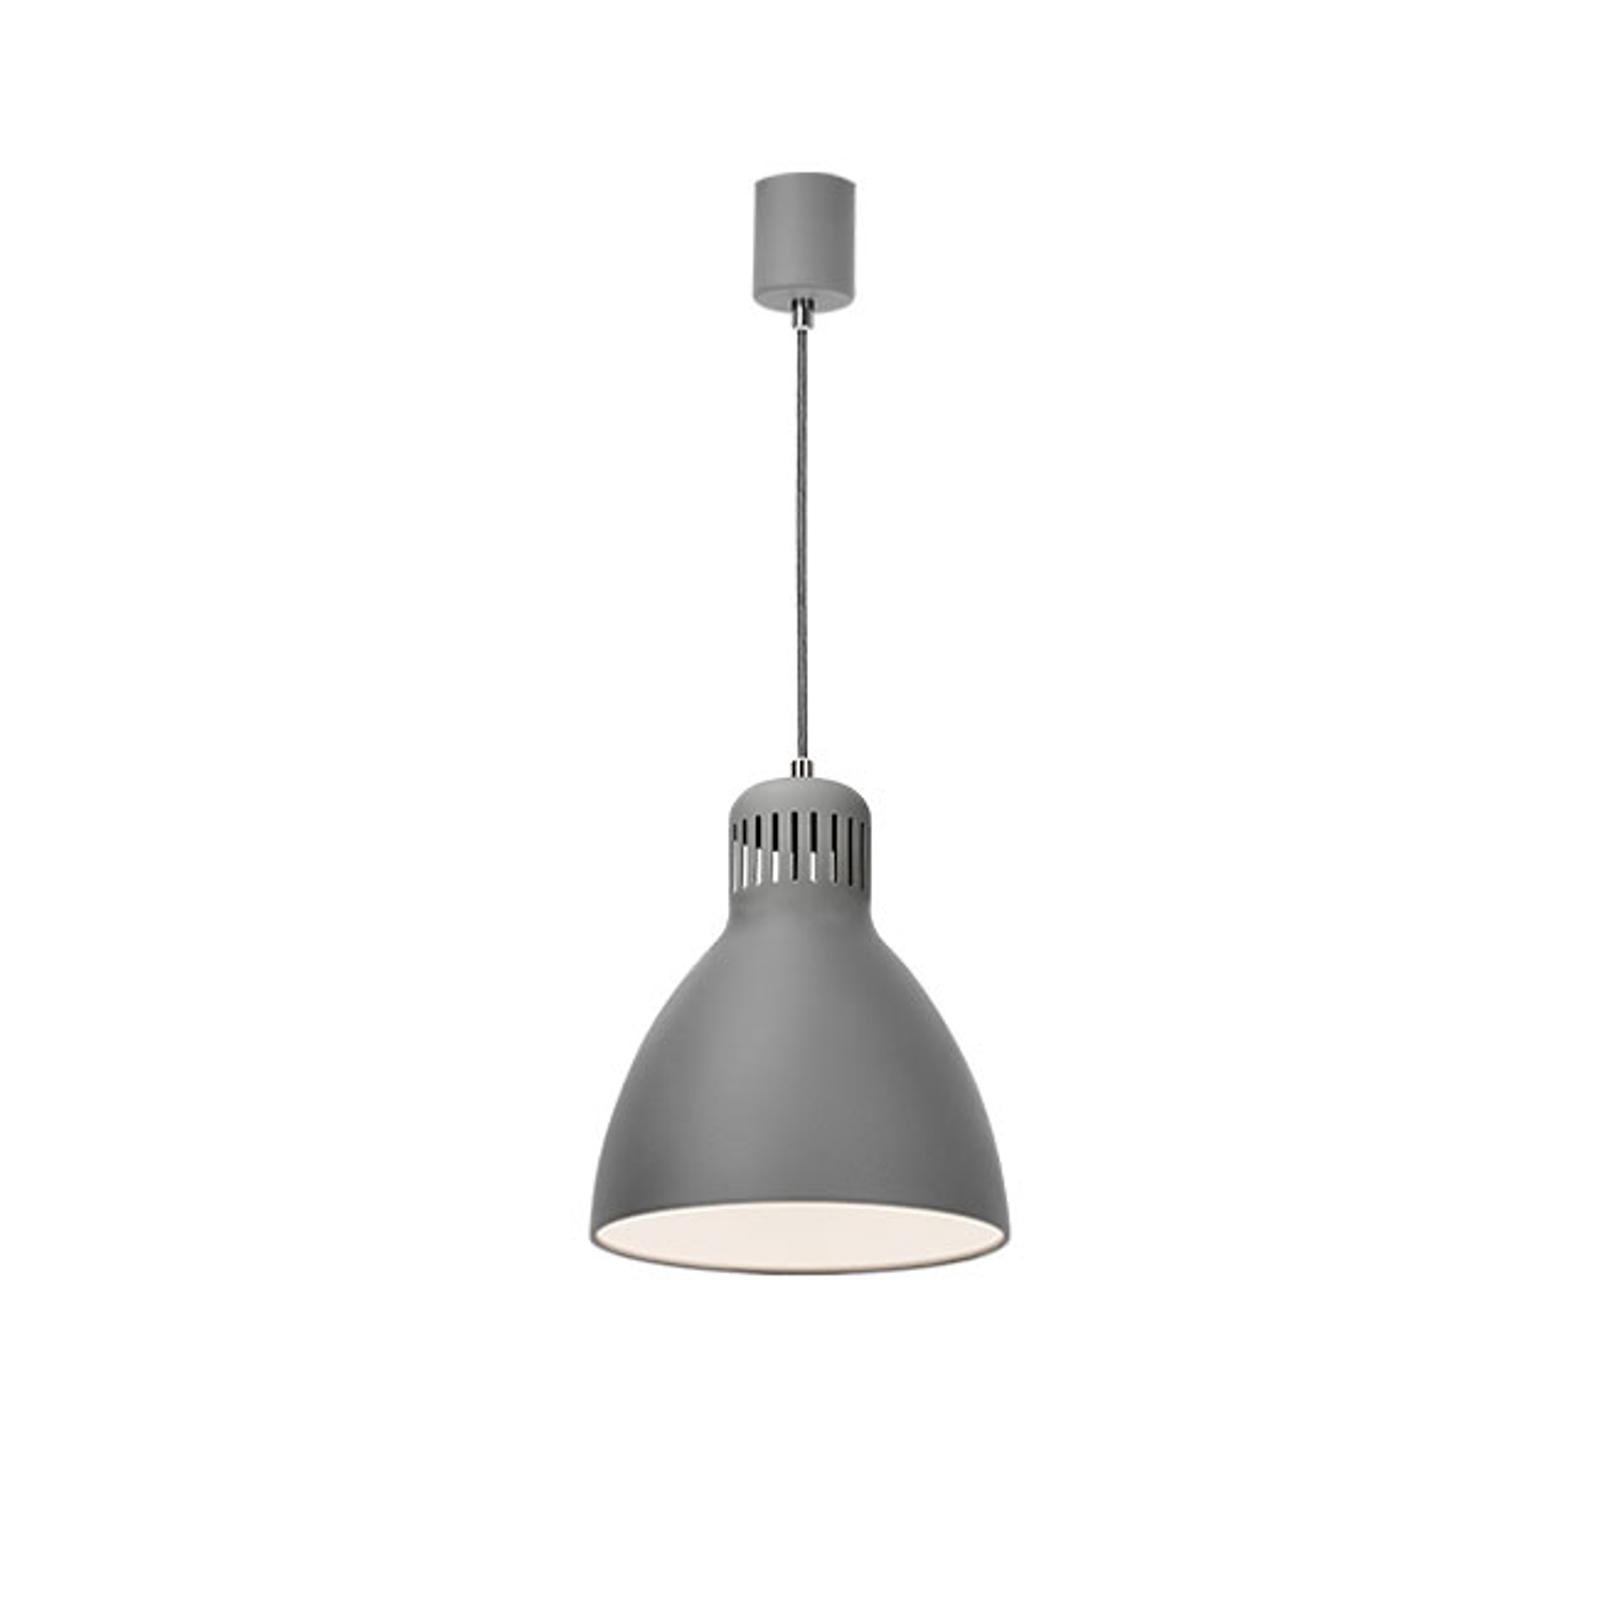 LED hanglamp L-1, 4.000 K, grijs